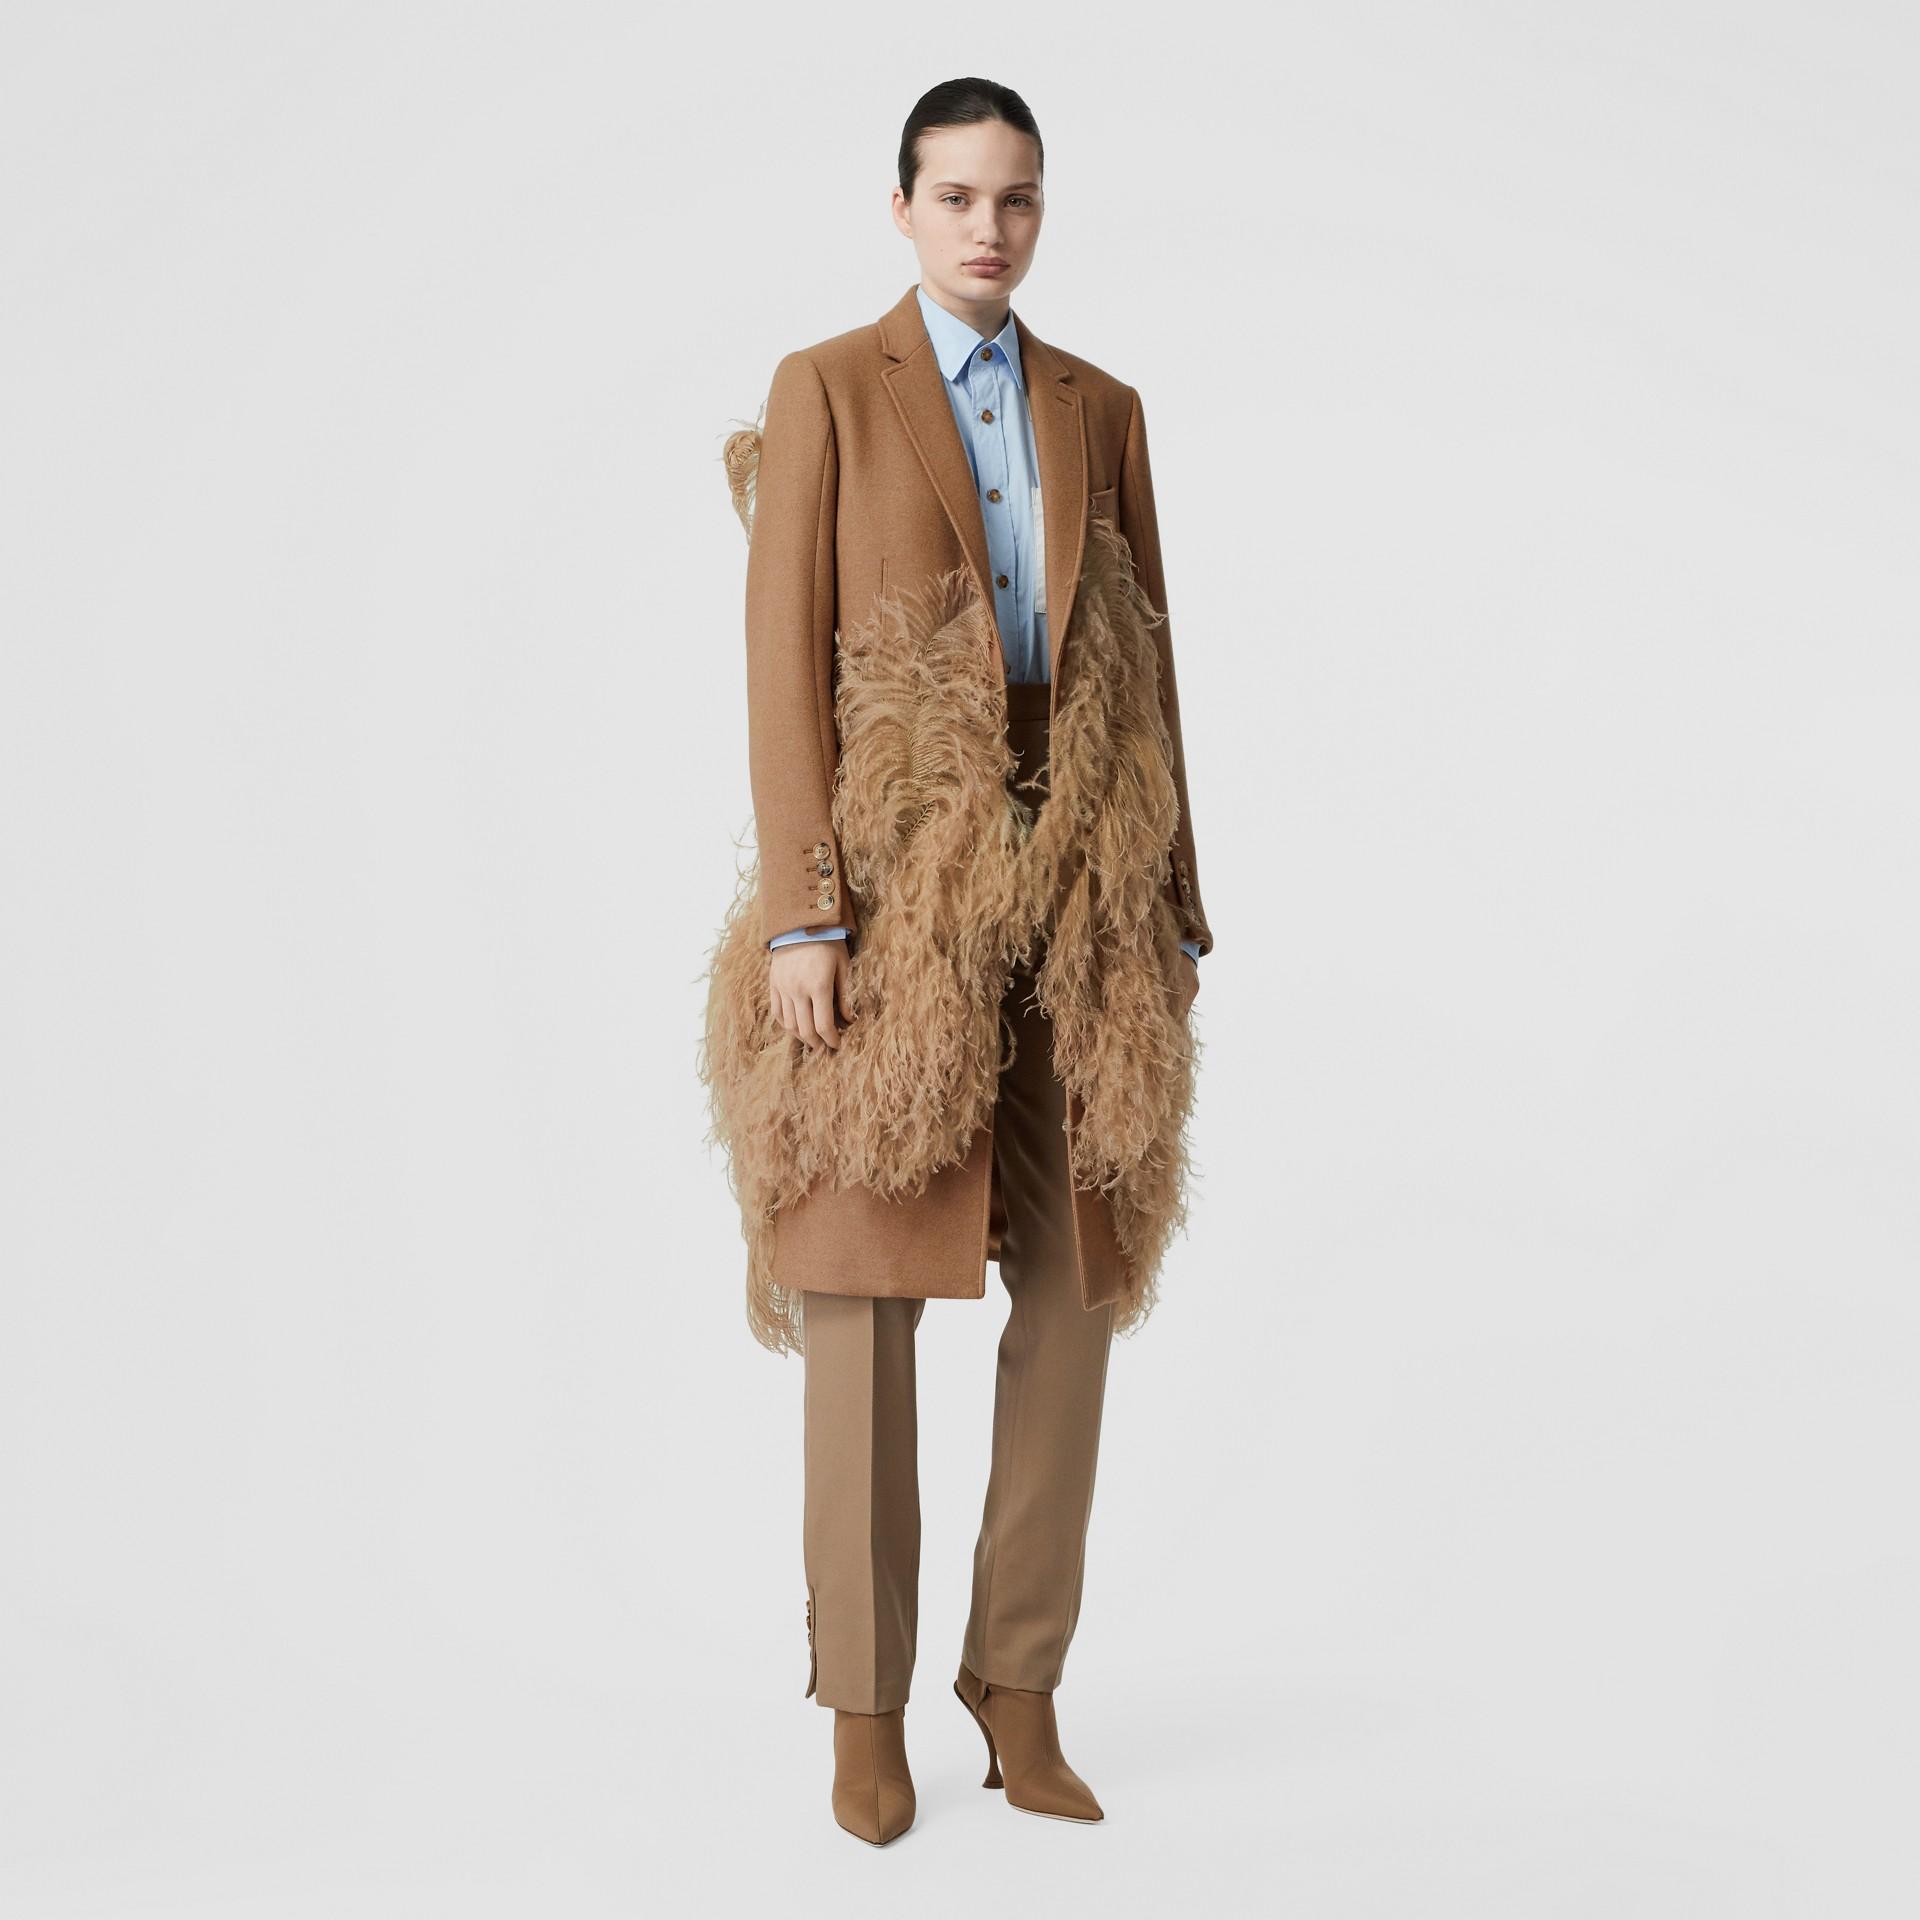 Abrigo de vestir en pelo de camello con detalle de plumas (Cámel) - Mujer | Burberry - imagen de la galería 0